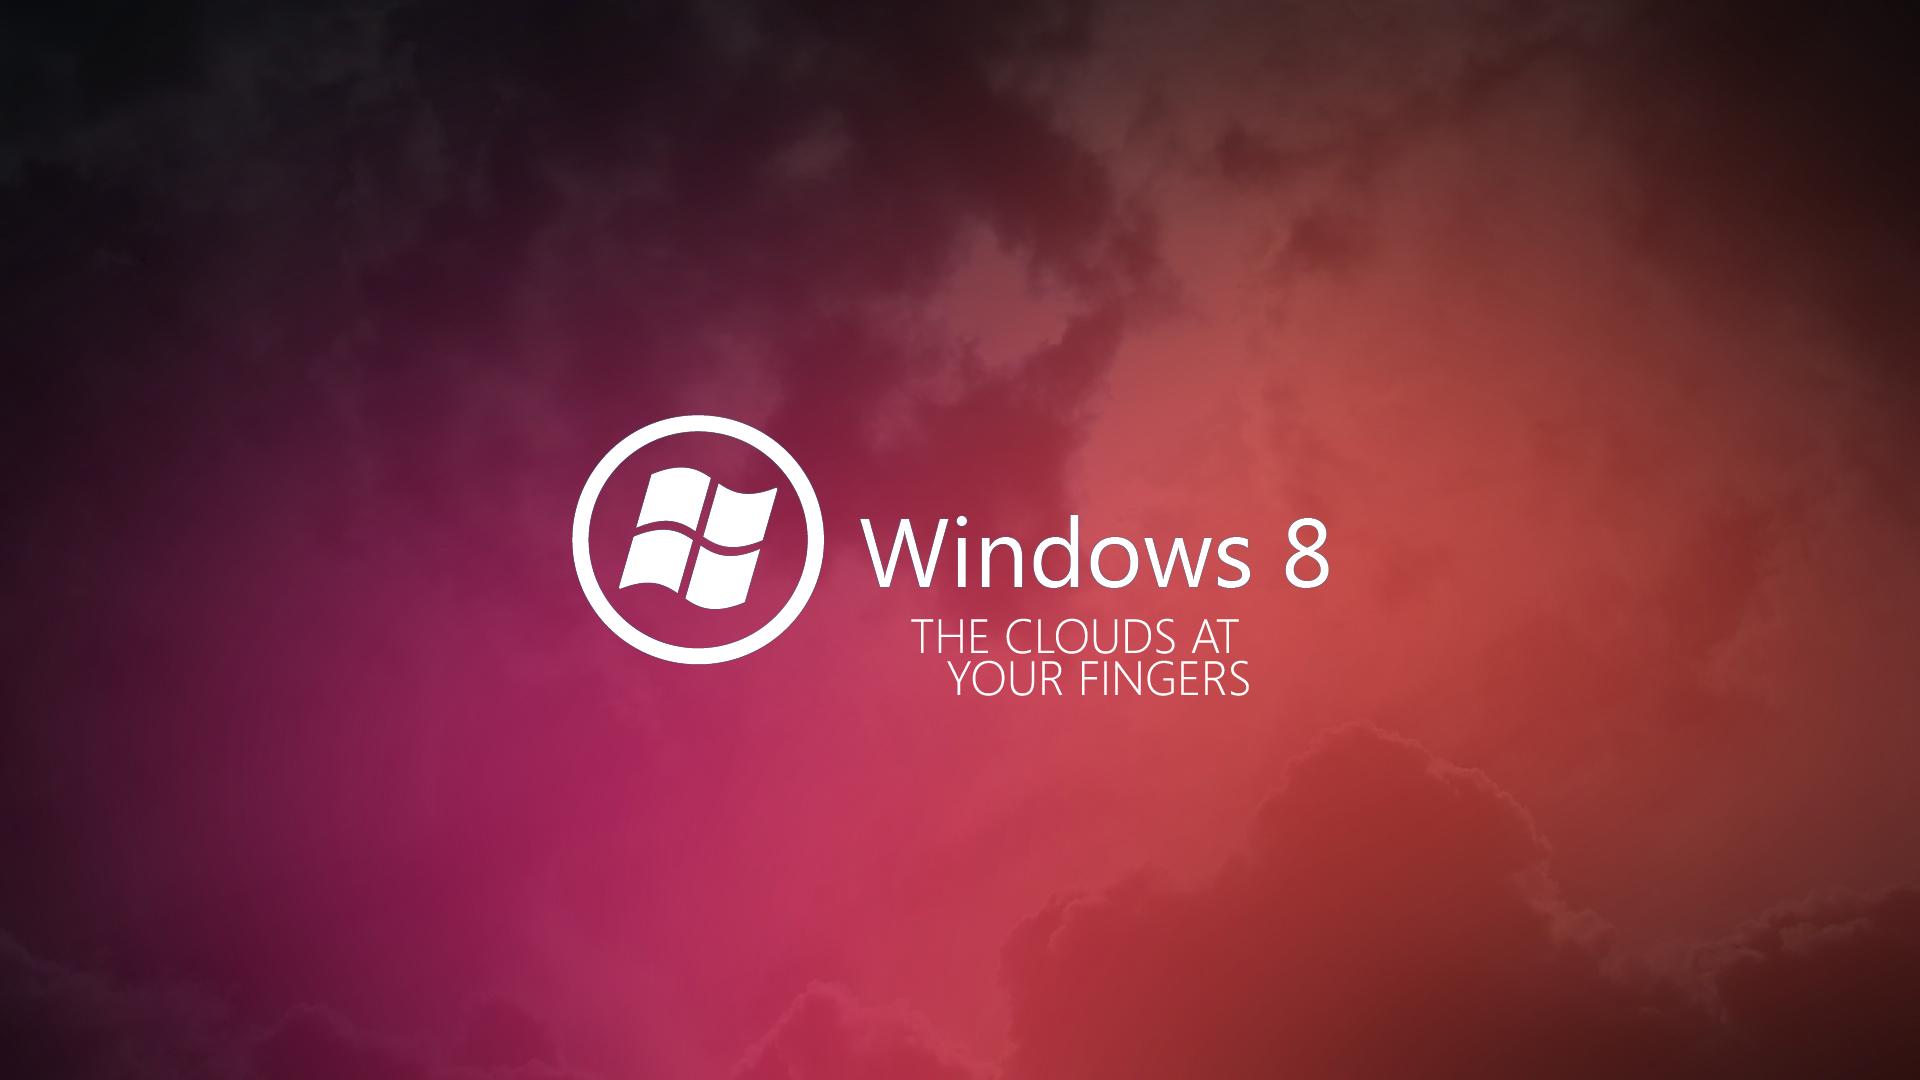 Windows 8 Wallpaper HD 1080p 7029850 1920x1080